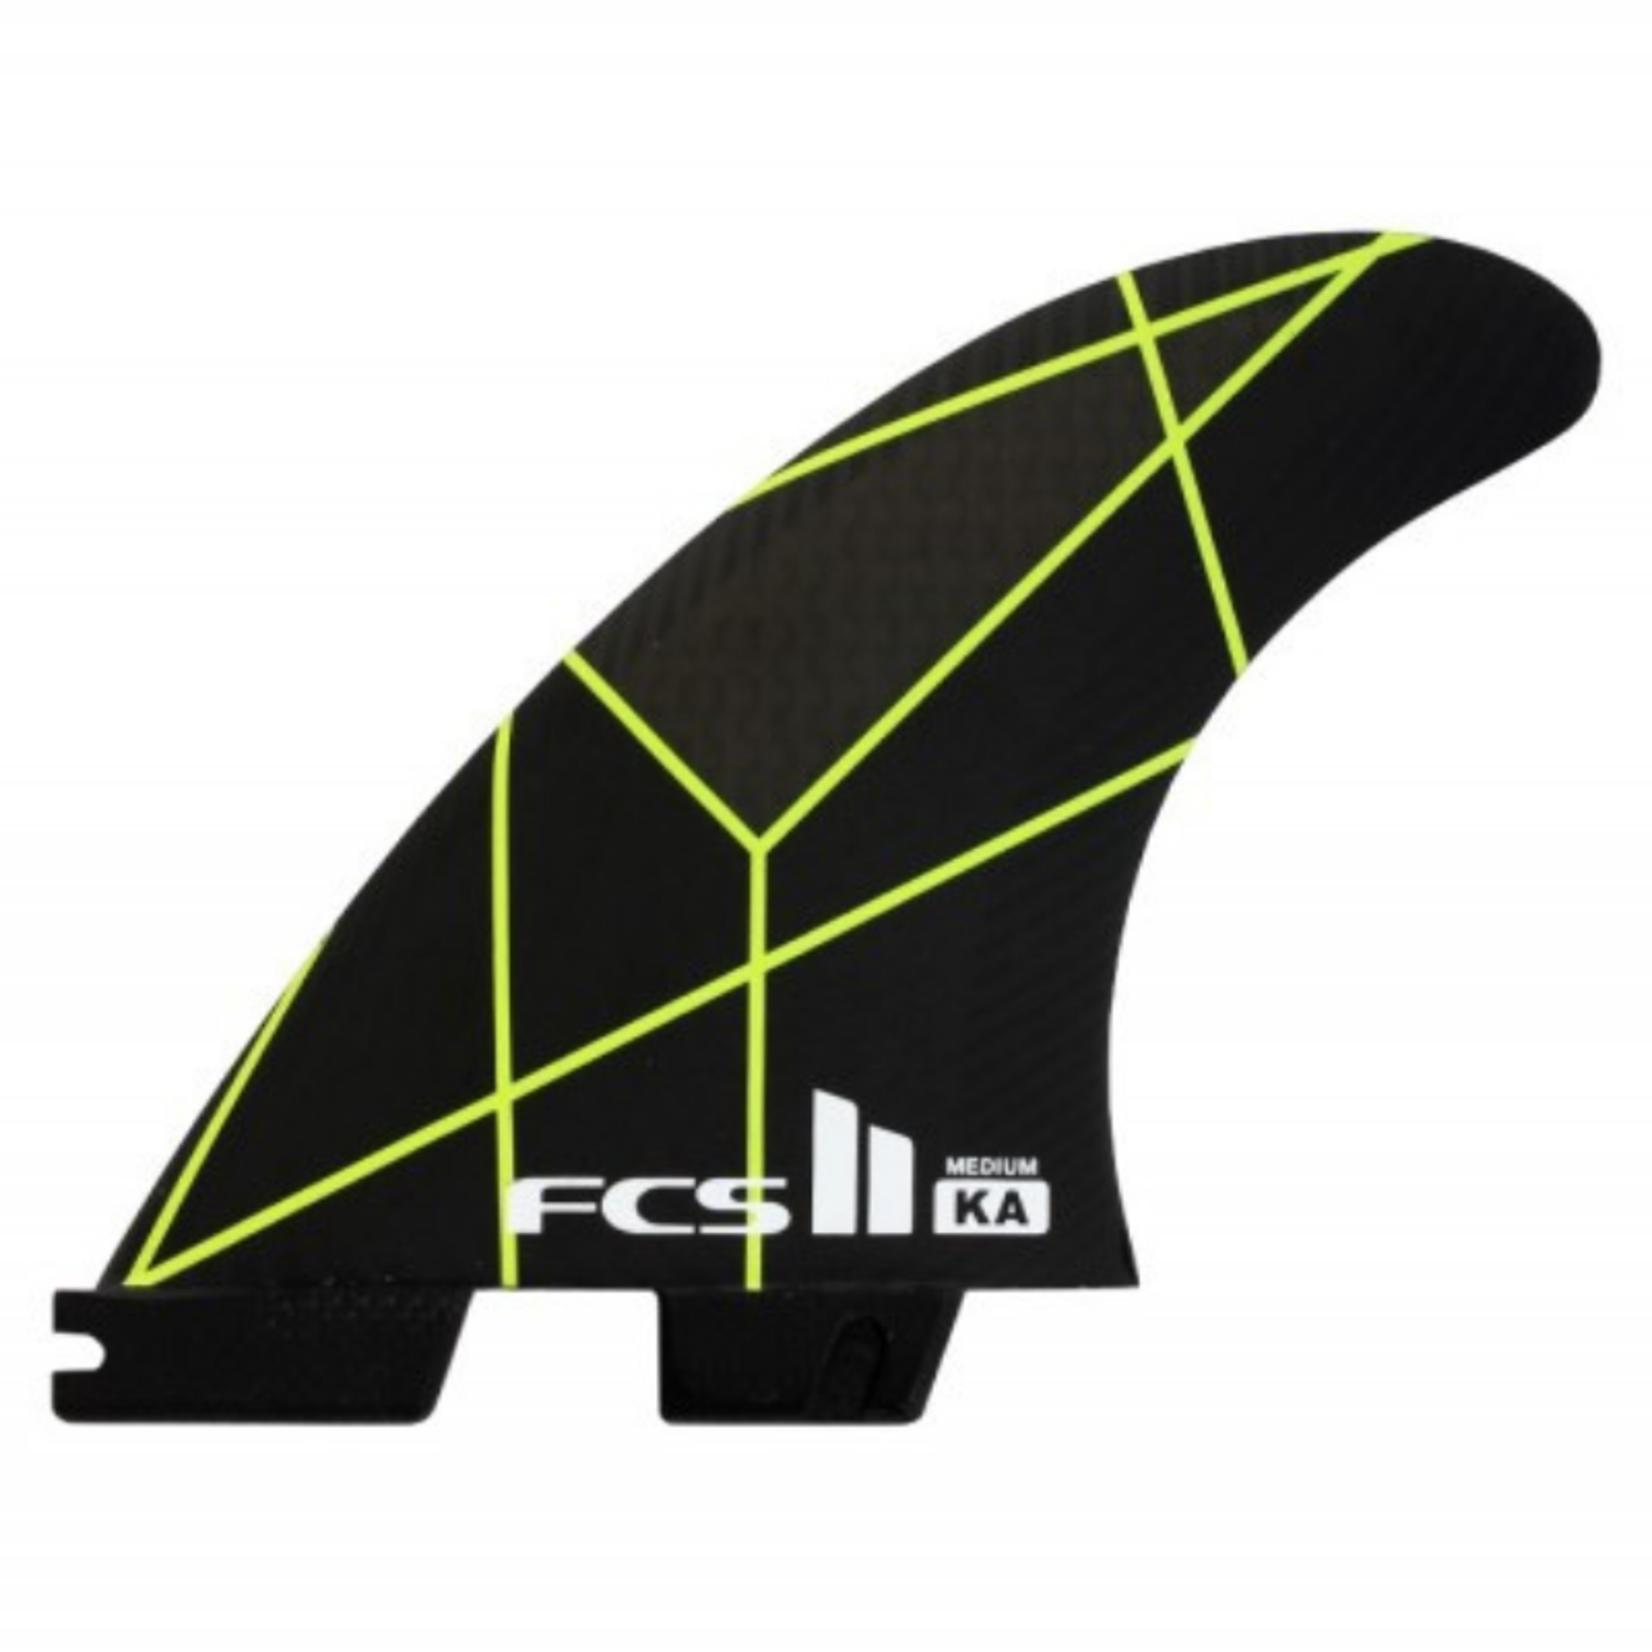 FCS II FCS II KA PC Yellow/Grey Tri Fins Medium